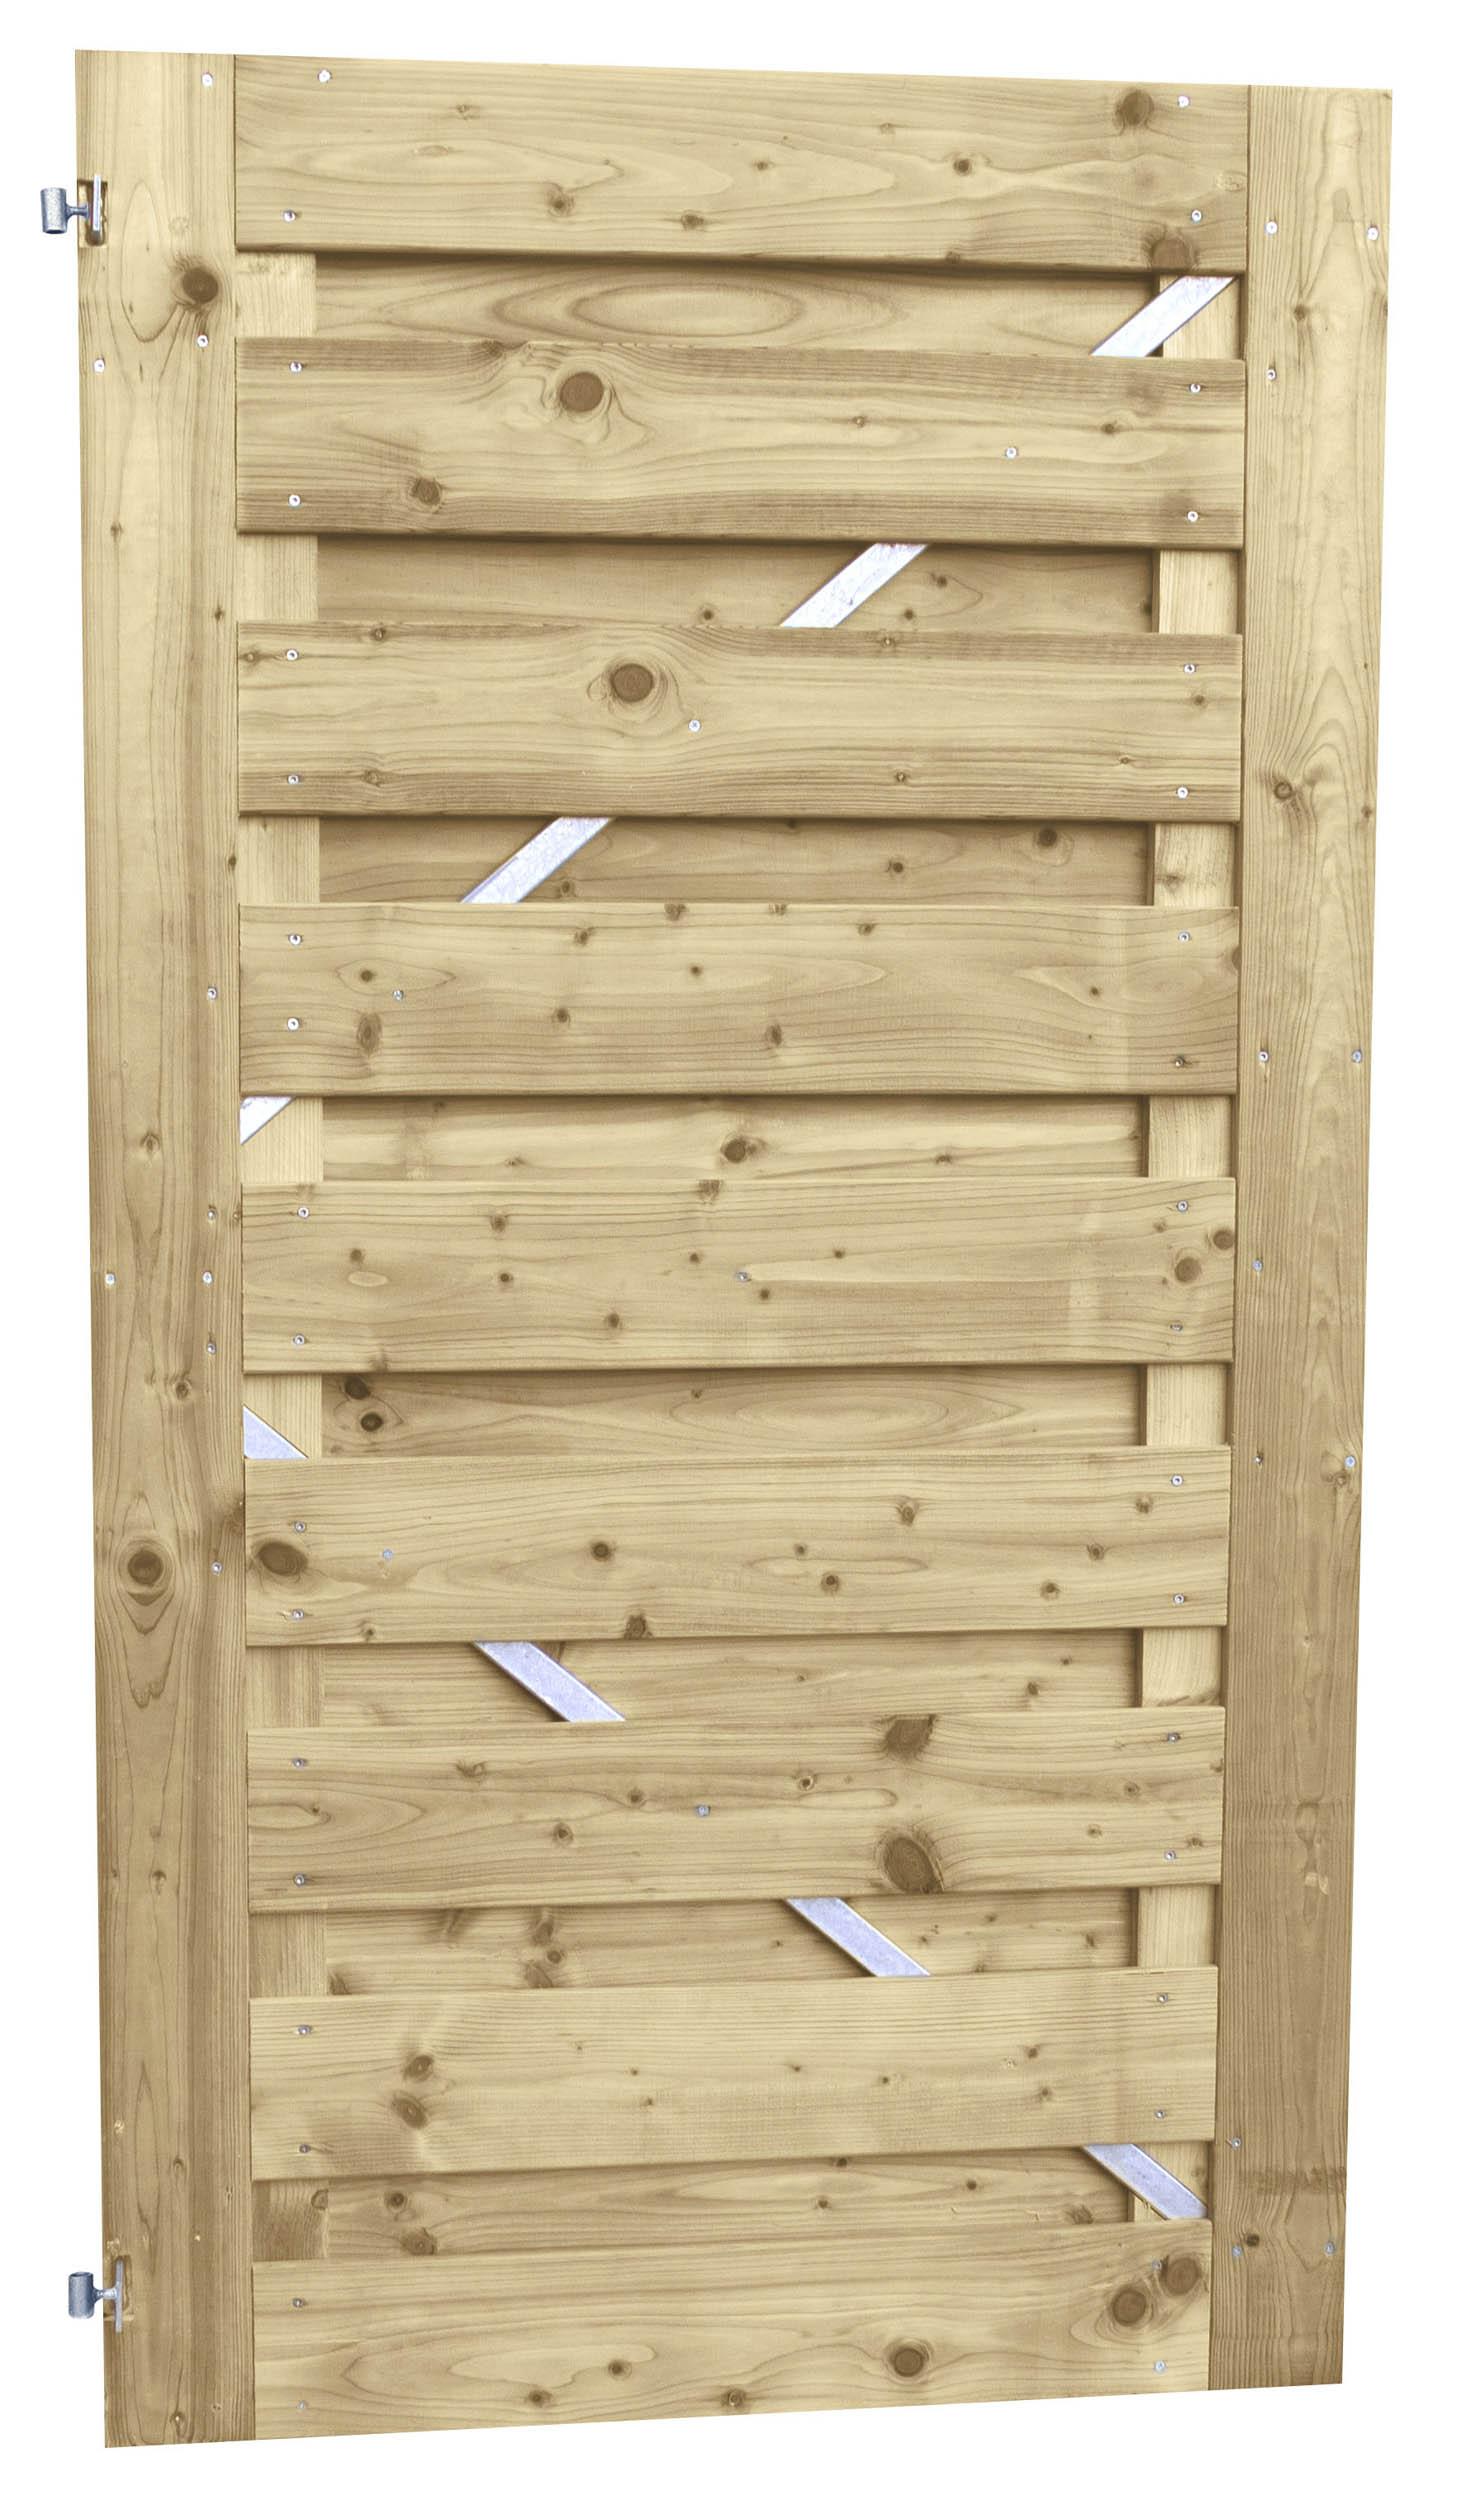 Woodvision tuinhout Hillhout tuindeur Jumbo op stalen frame, afmeting 100 x 180 cm, geïmpregneerd vuren